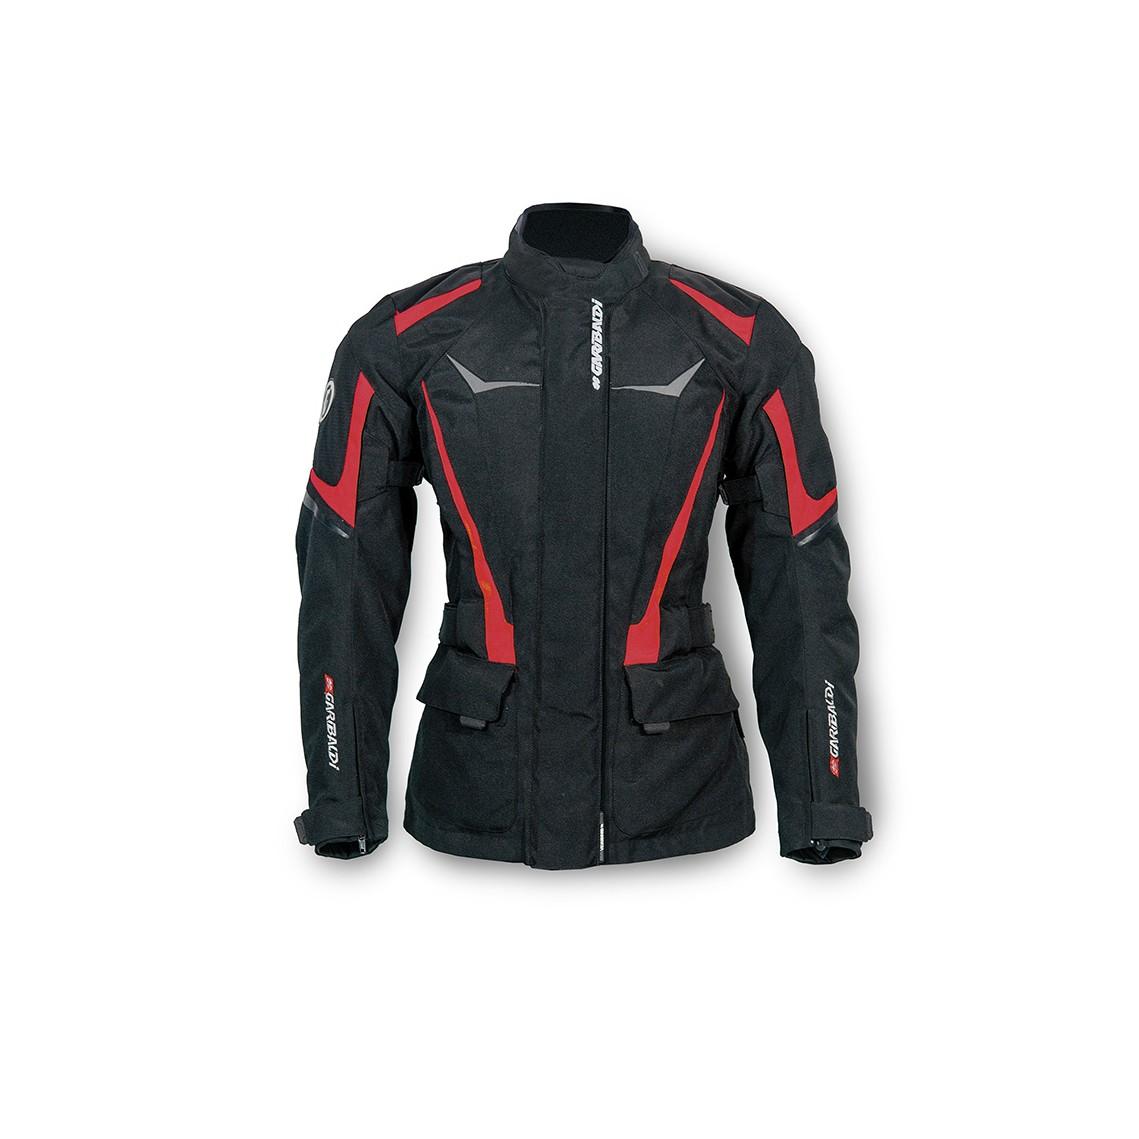 7c9f3e1481b ... Chaqueta de Moto Invierno para Mujer Impermeable y Transpirable Curve  Lady Roja